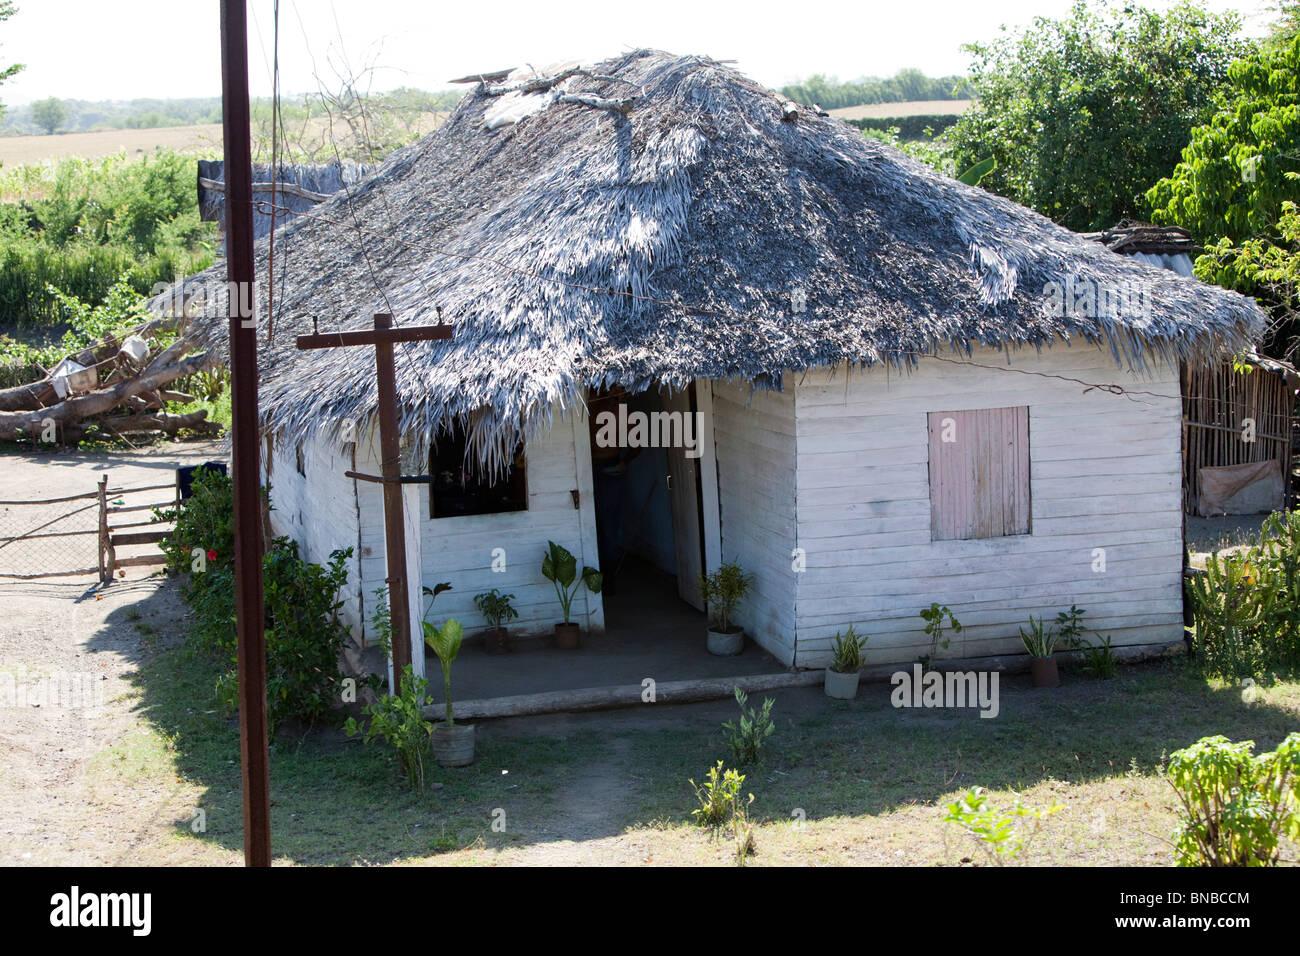 cuban house. - Stock Image